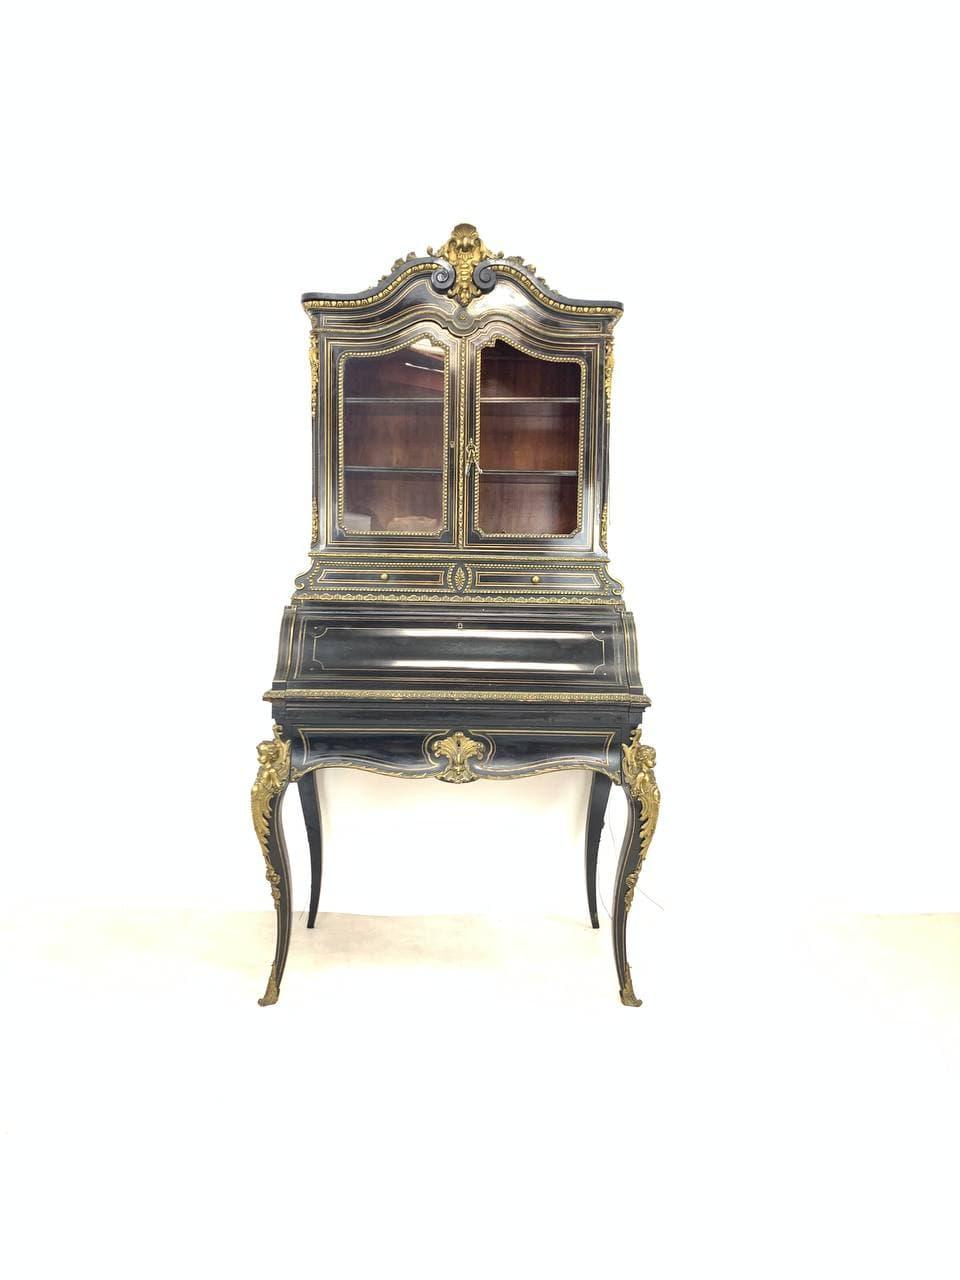 Антикварный секретер-витрина эпохи Наполеона III